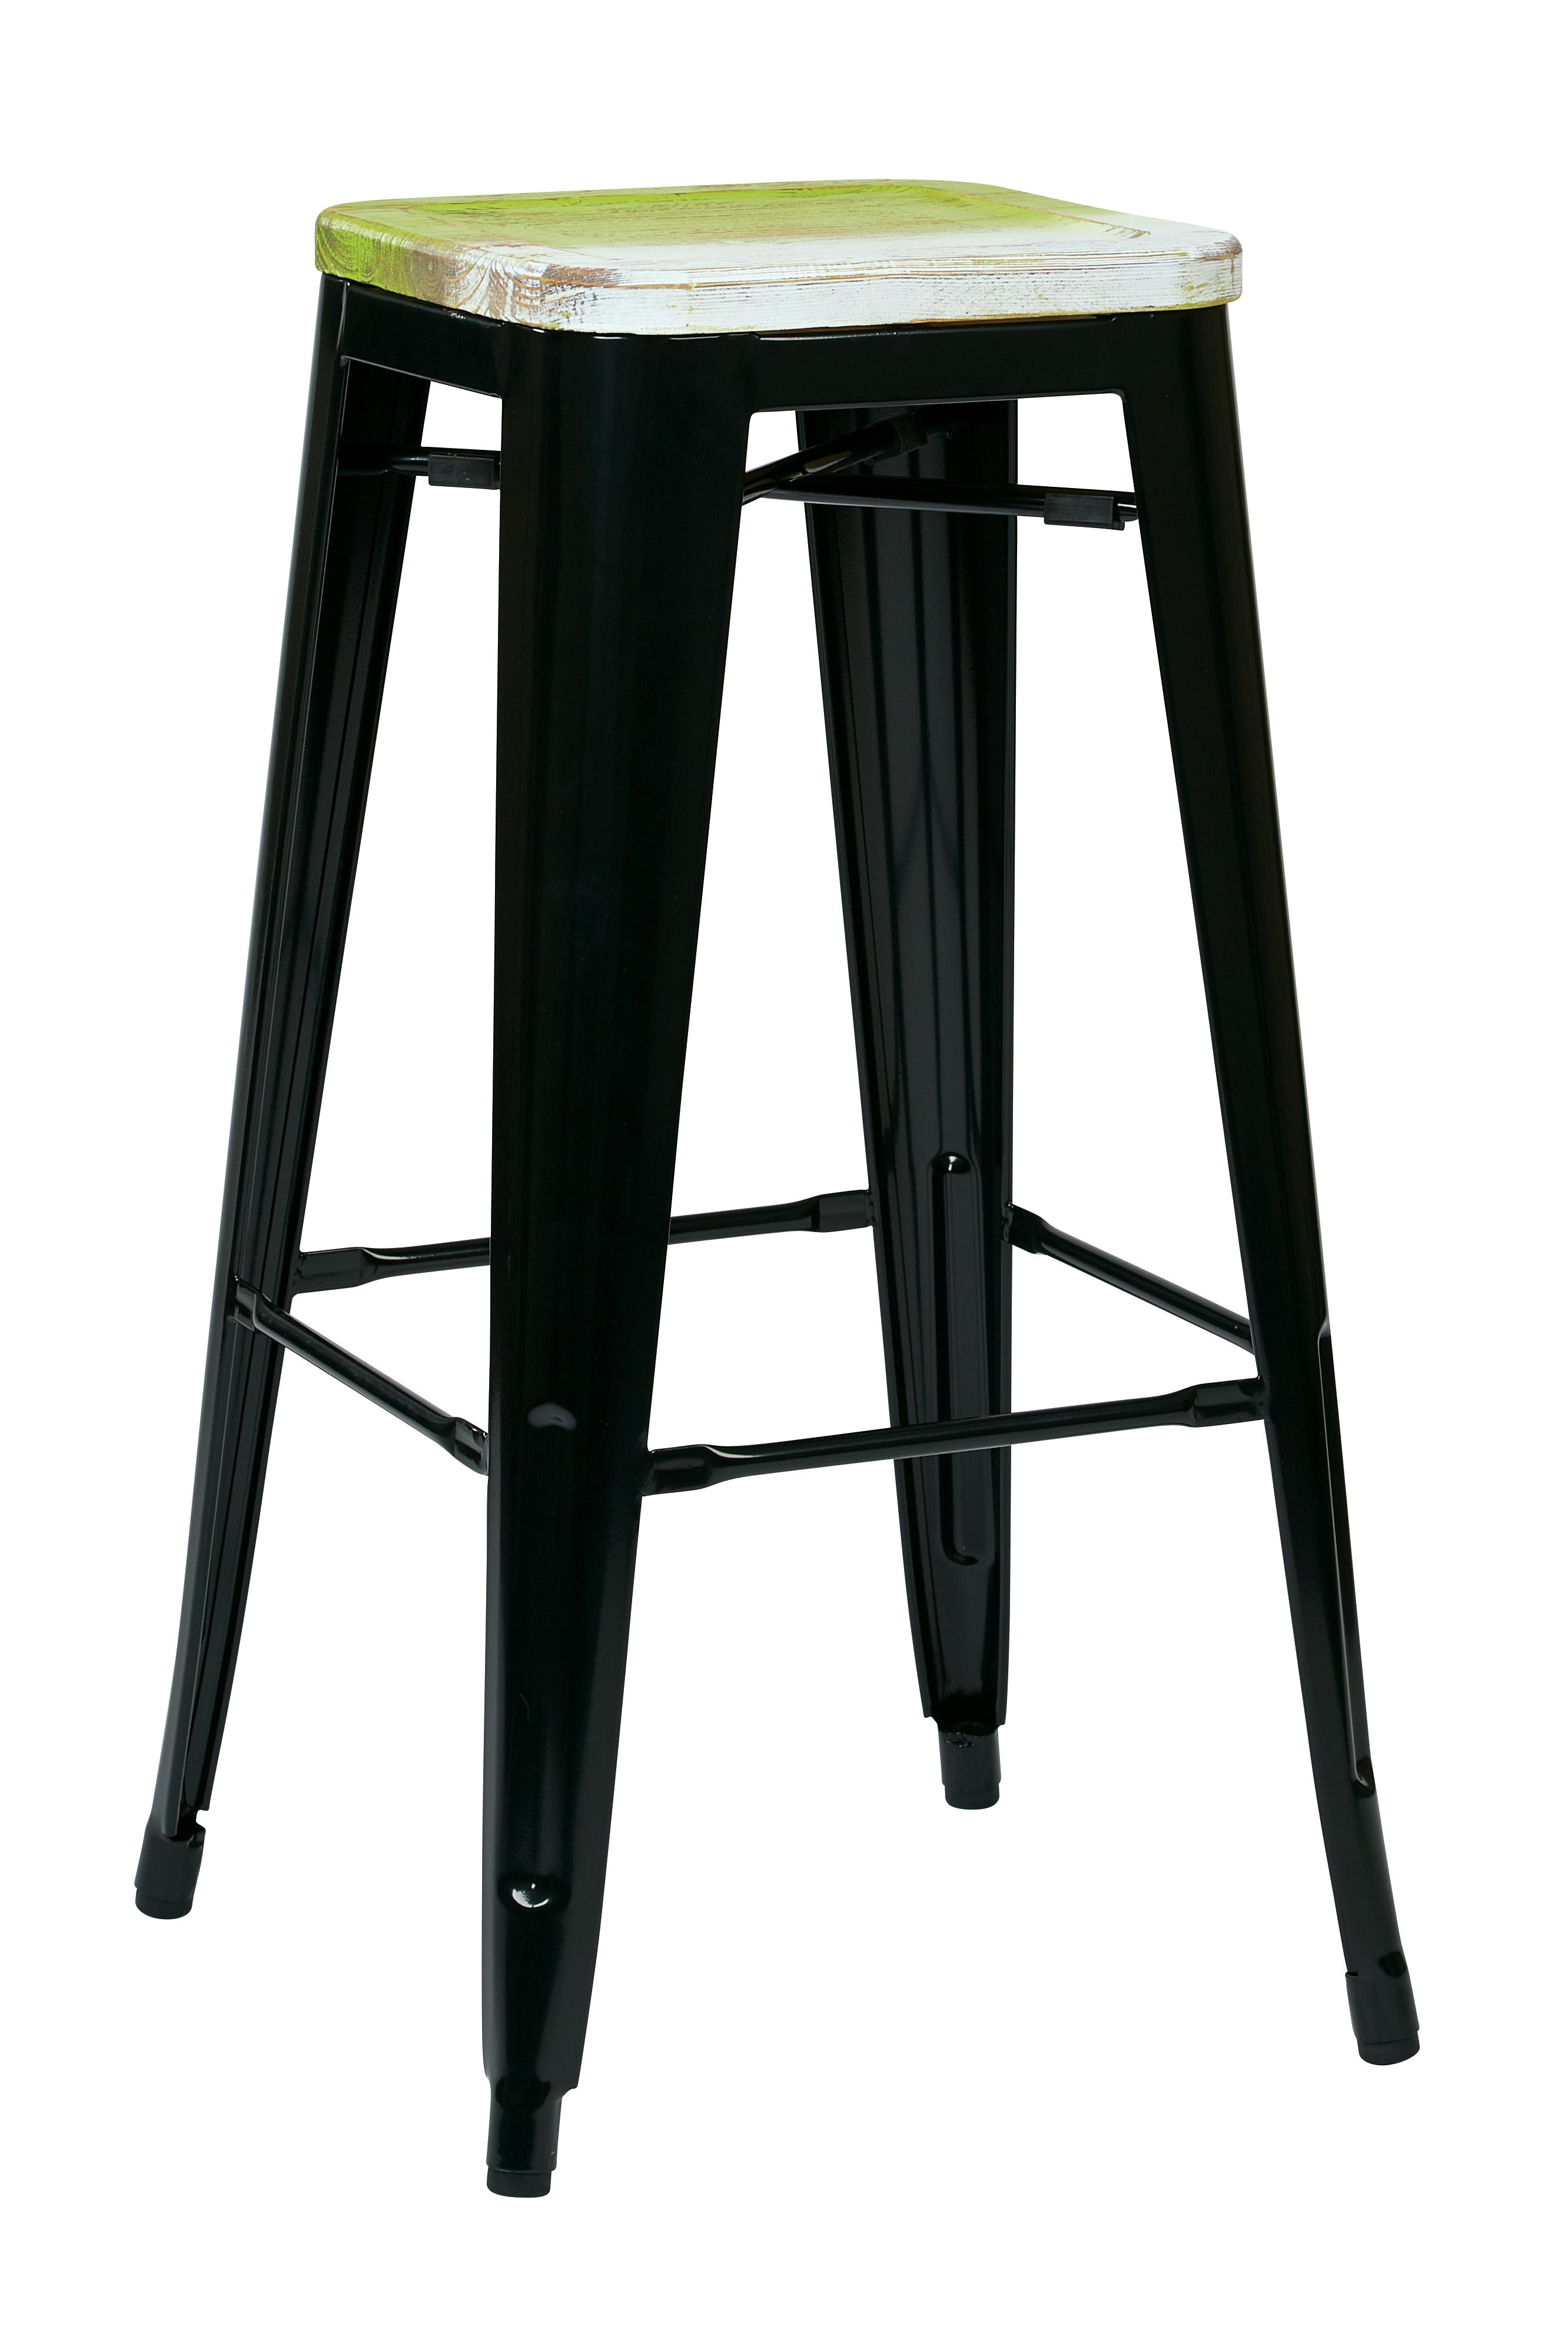 Bristow 30 Metal Barstool With Vintage Wood Seat 2 Pack Walmartcom